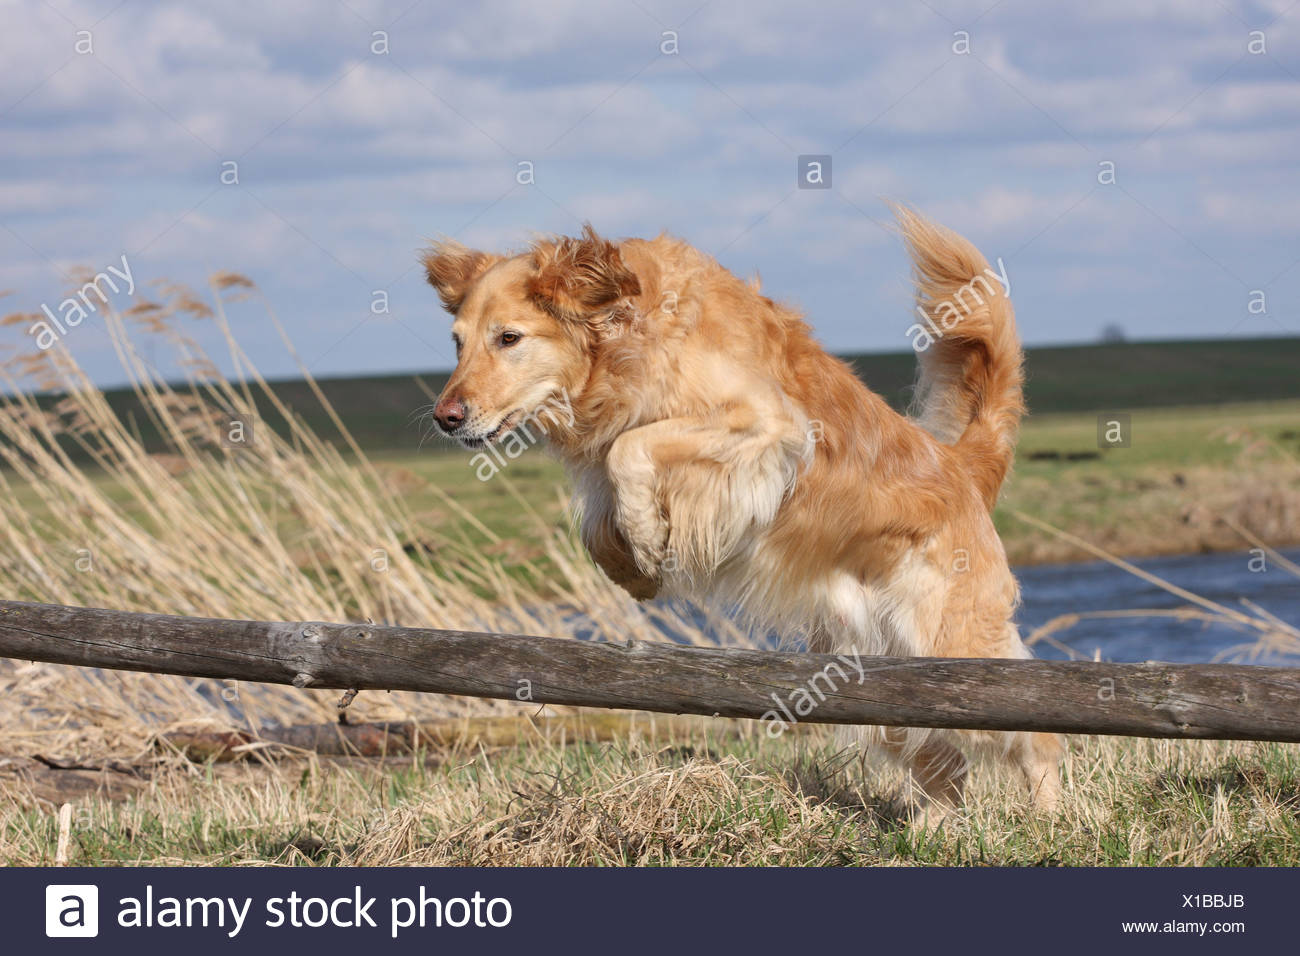 jumping Golden Retriever - Stock Image